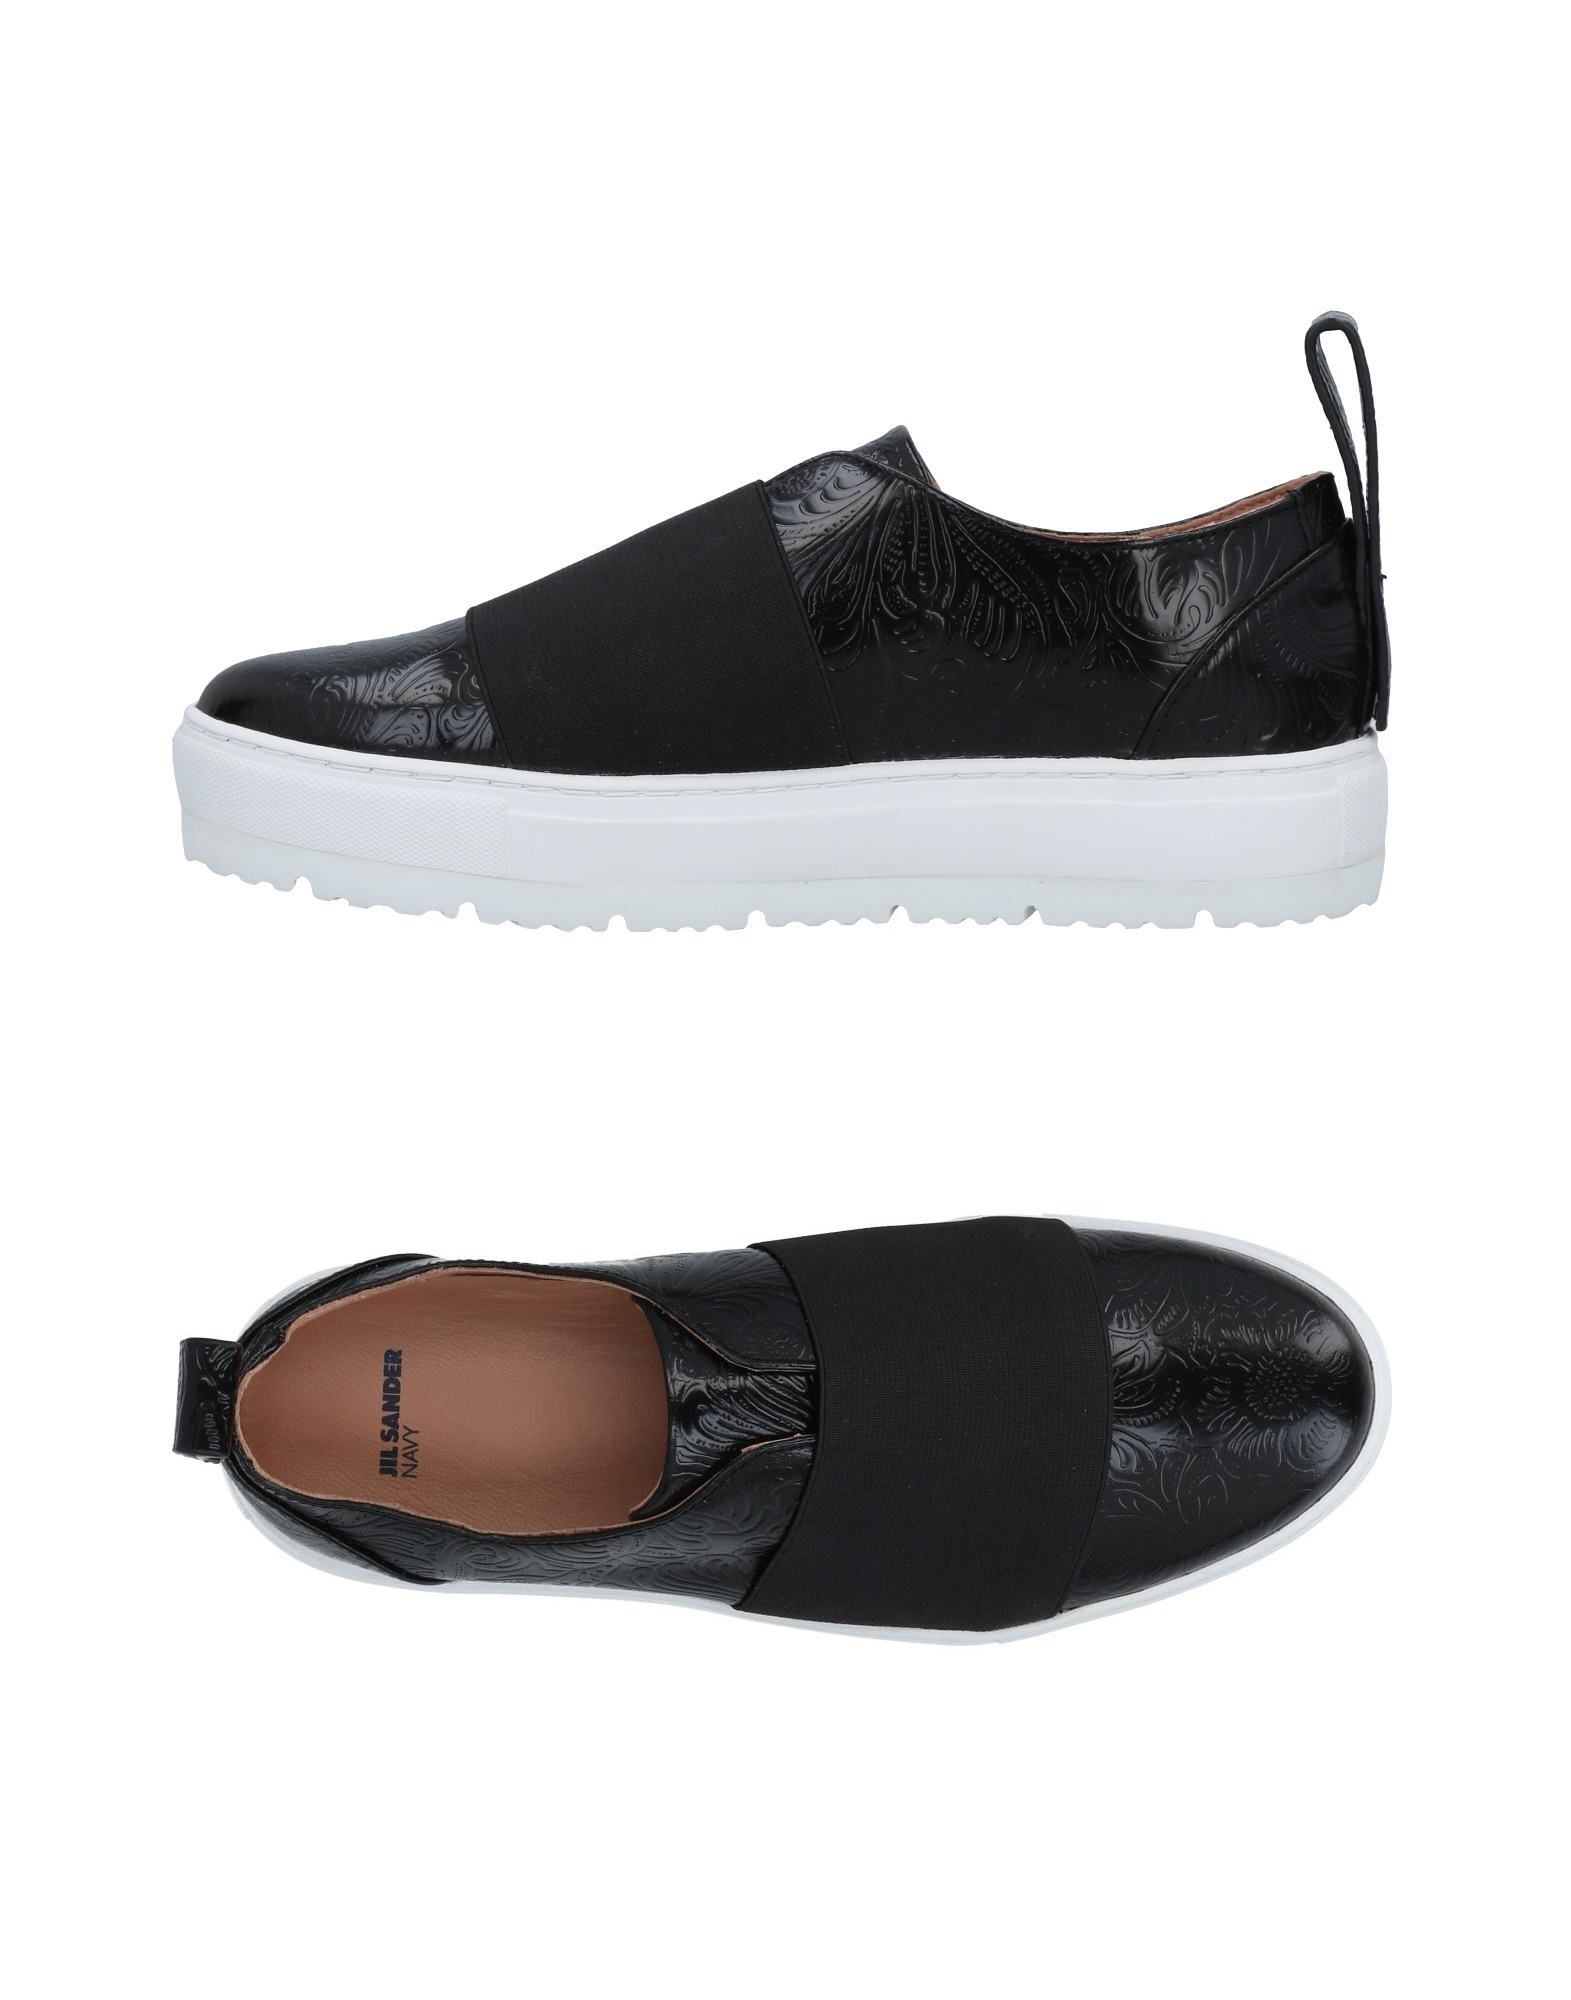 Jil Sander Navy Sneakers Damen  11490835EHGut aussehende strapazierfähige Schuhe